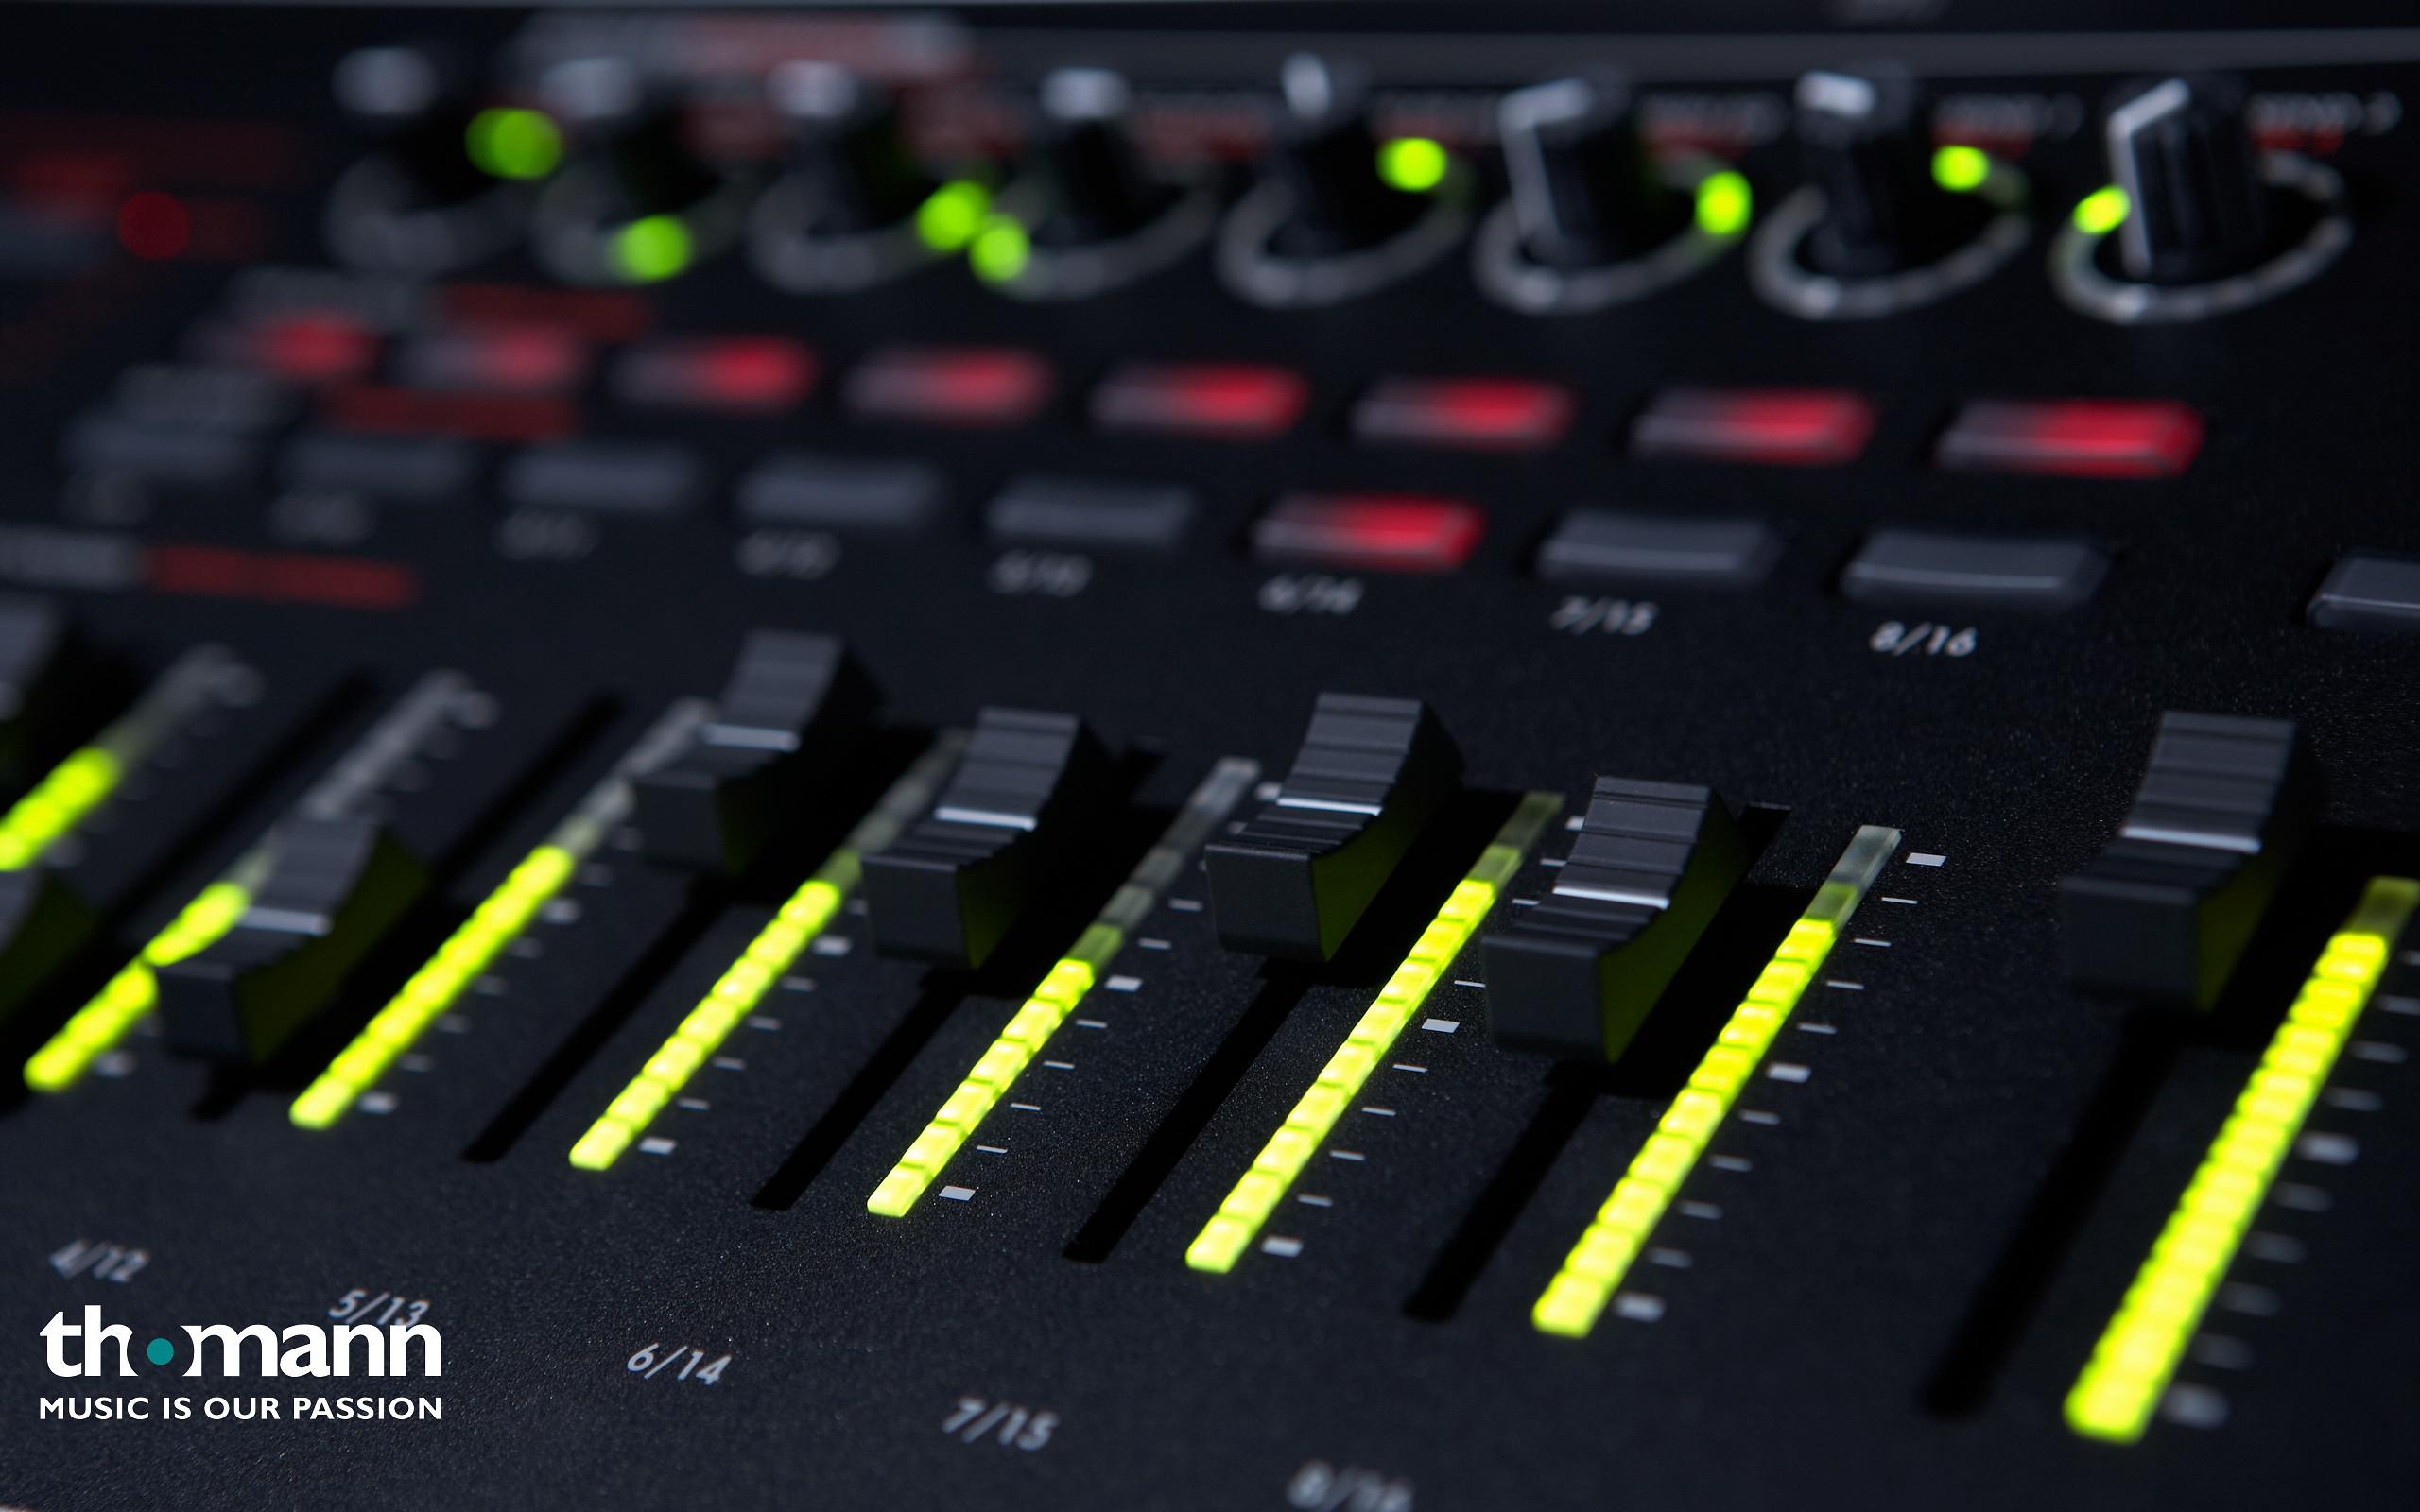 Recording Studio Wallpaper Wide 38 Desktop | Wallpaperiz.com